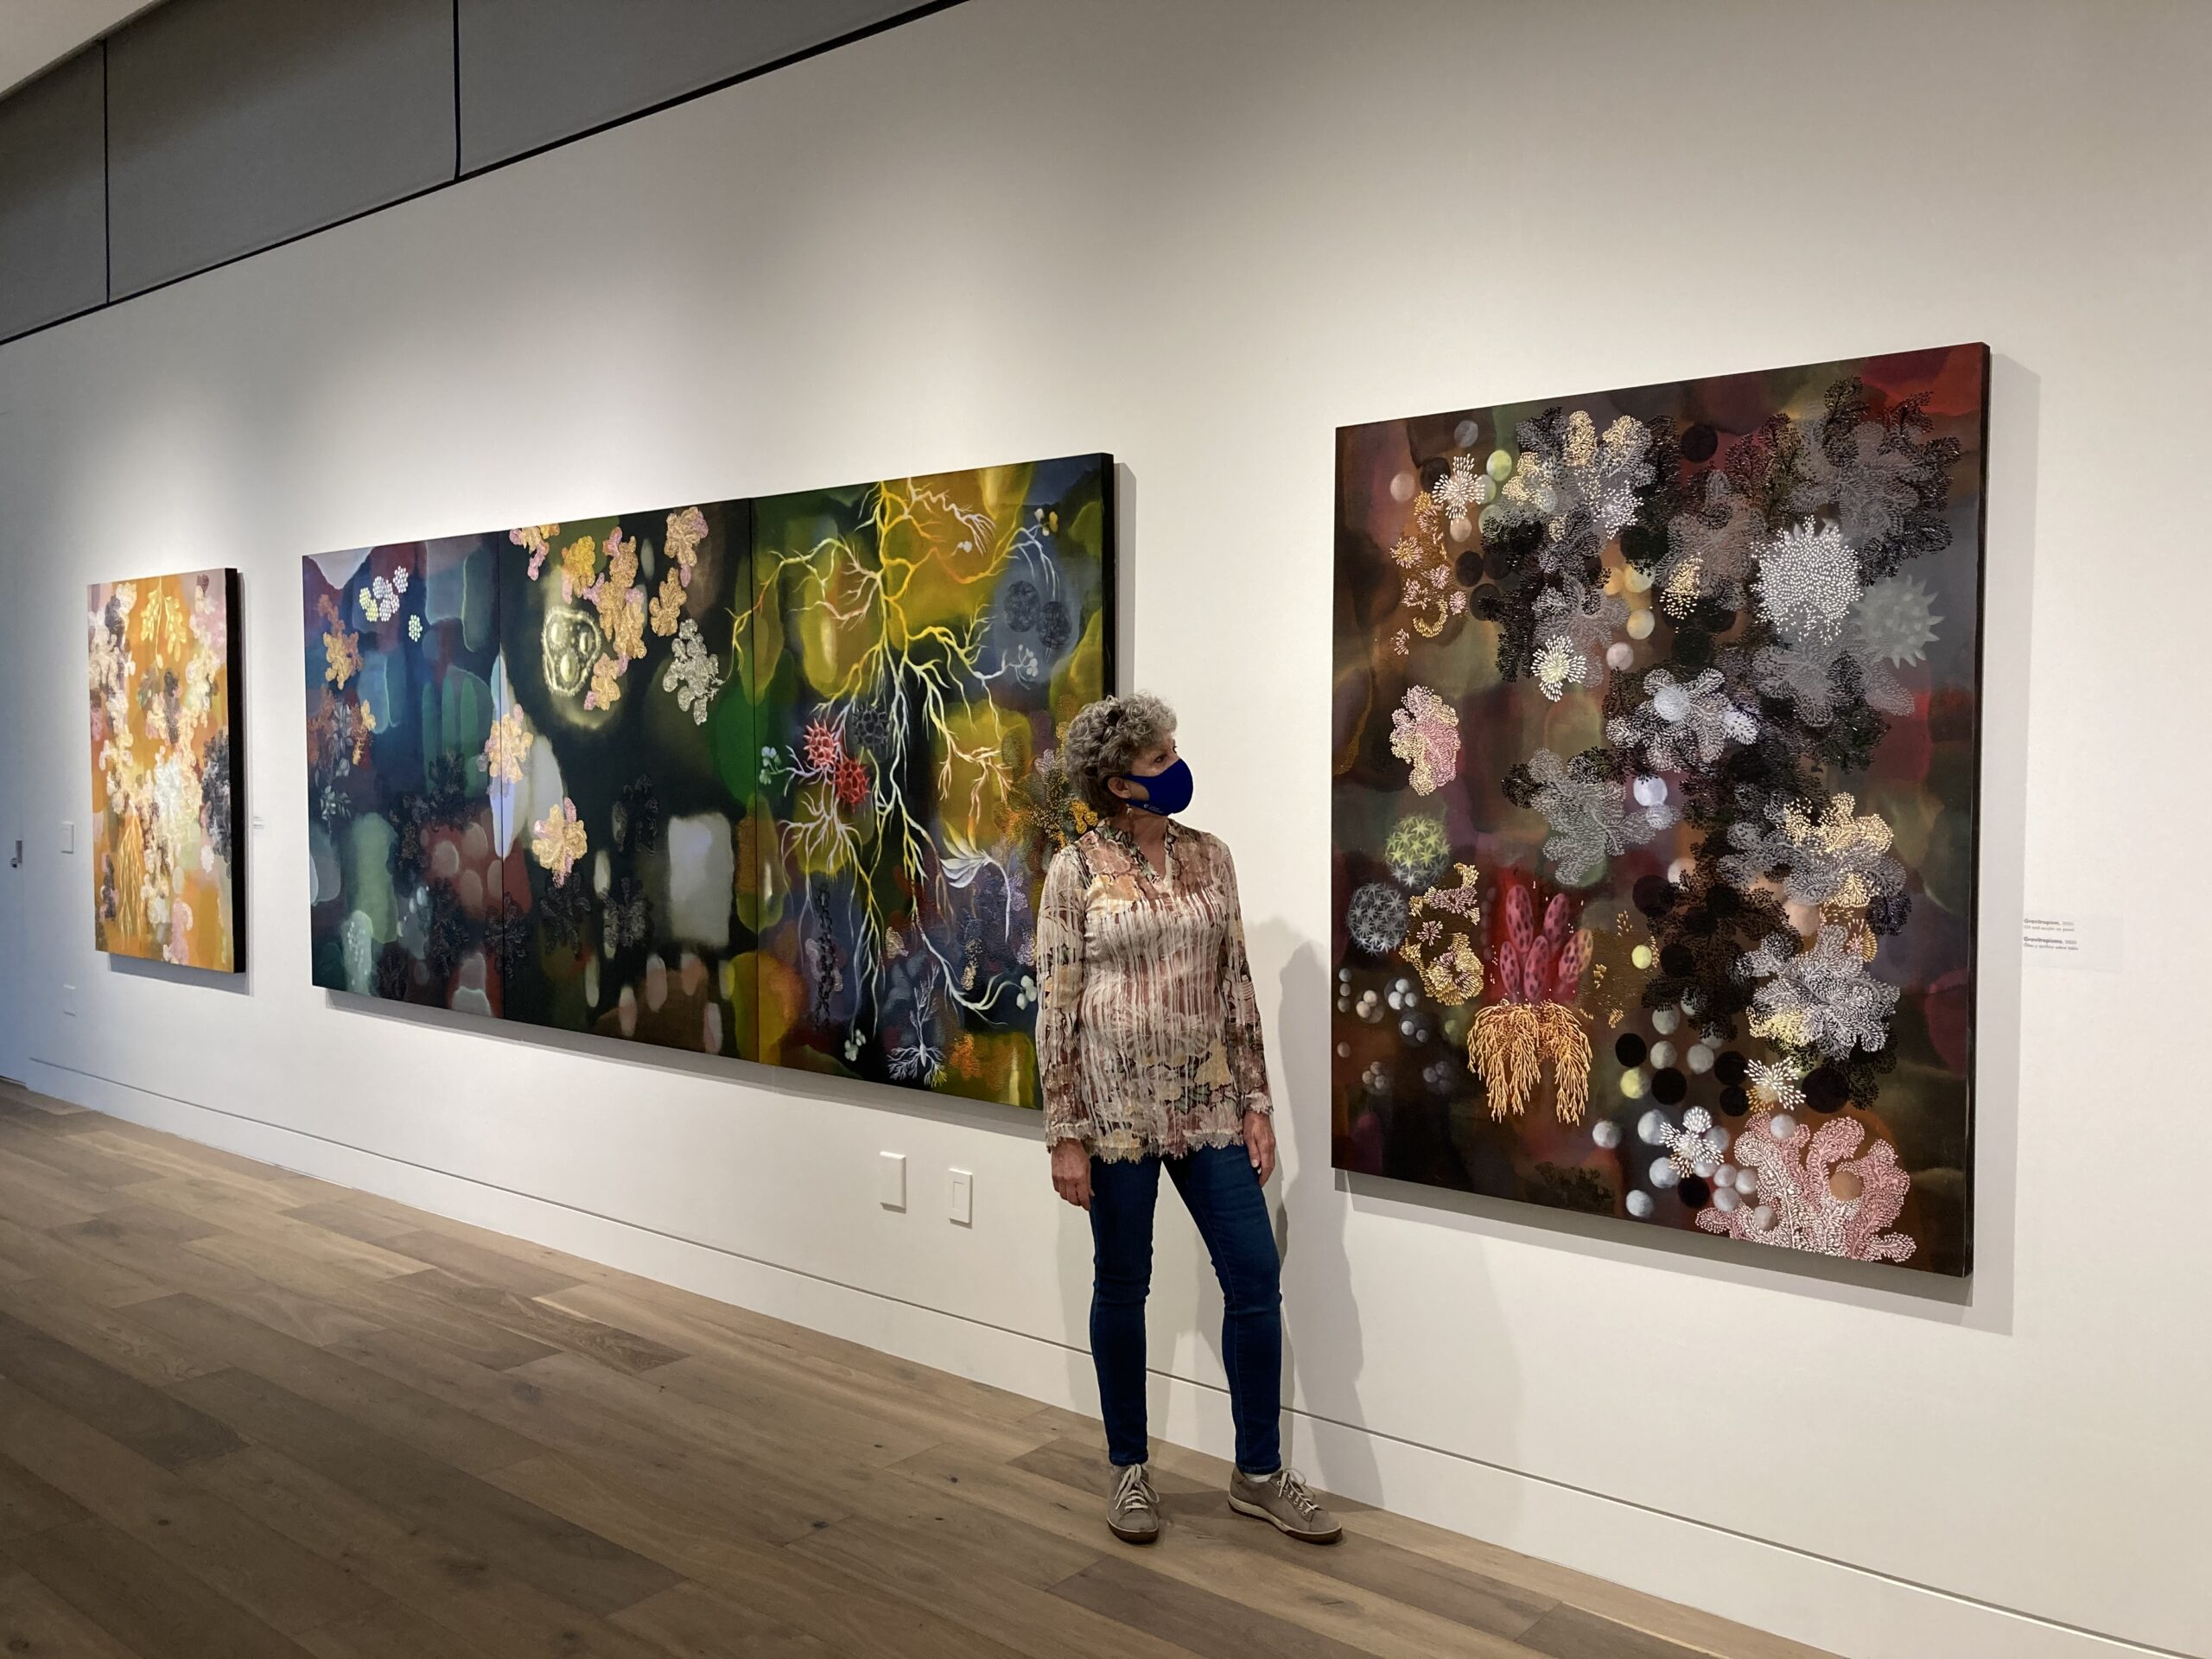 Visit a Denver Museum